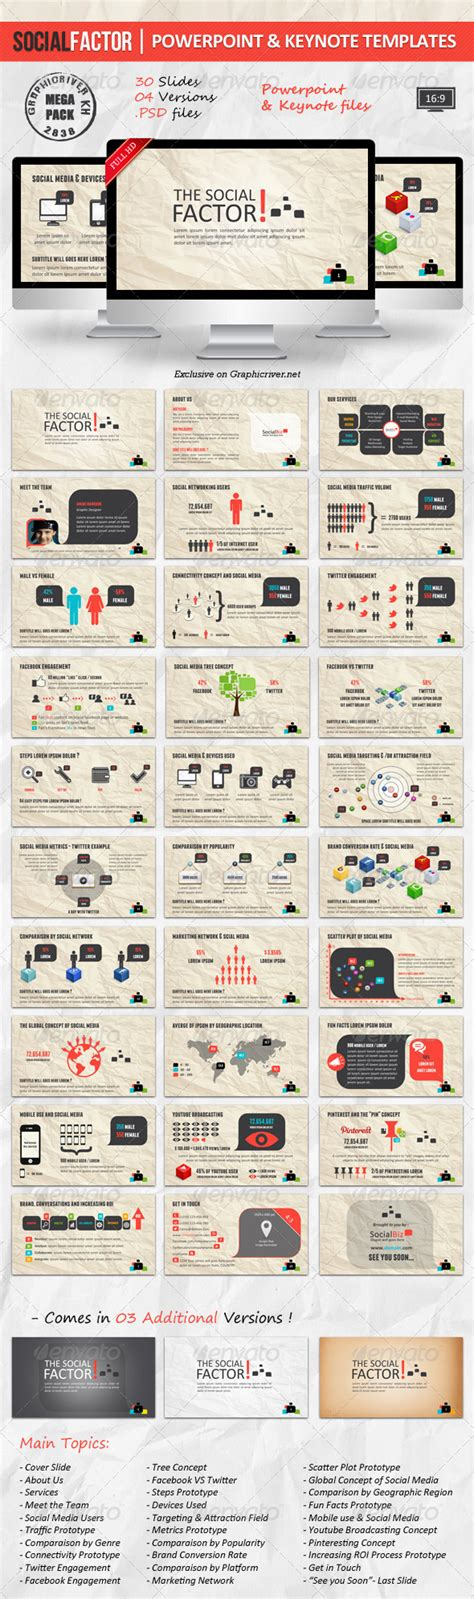 socialfactor powerpoint and keynote templates www